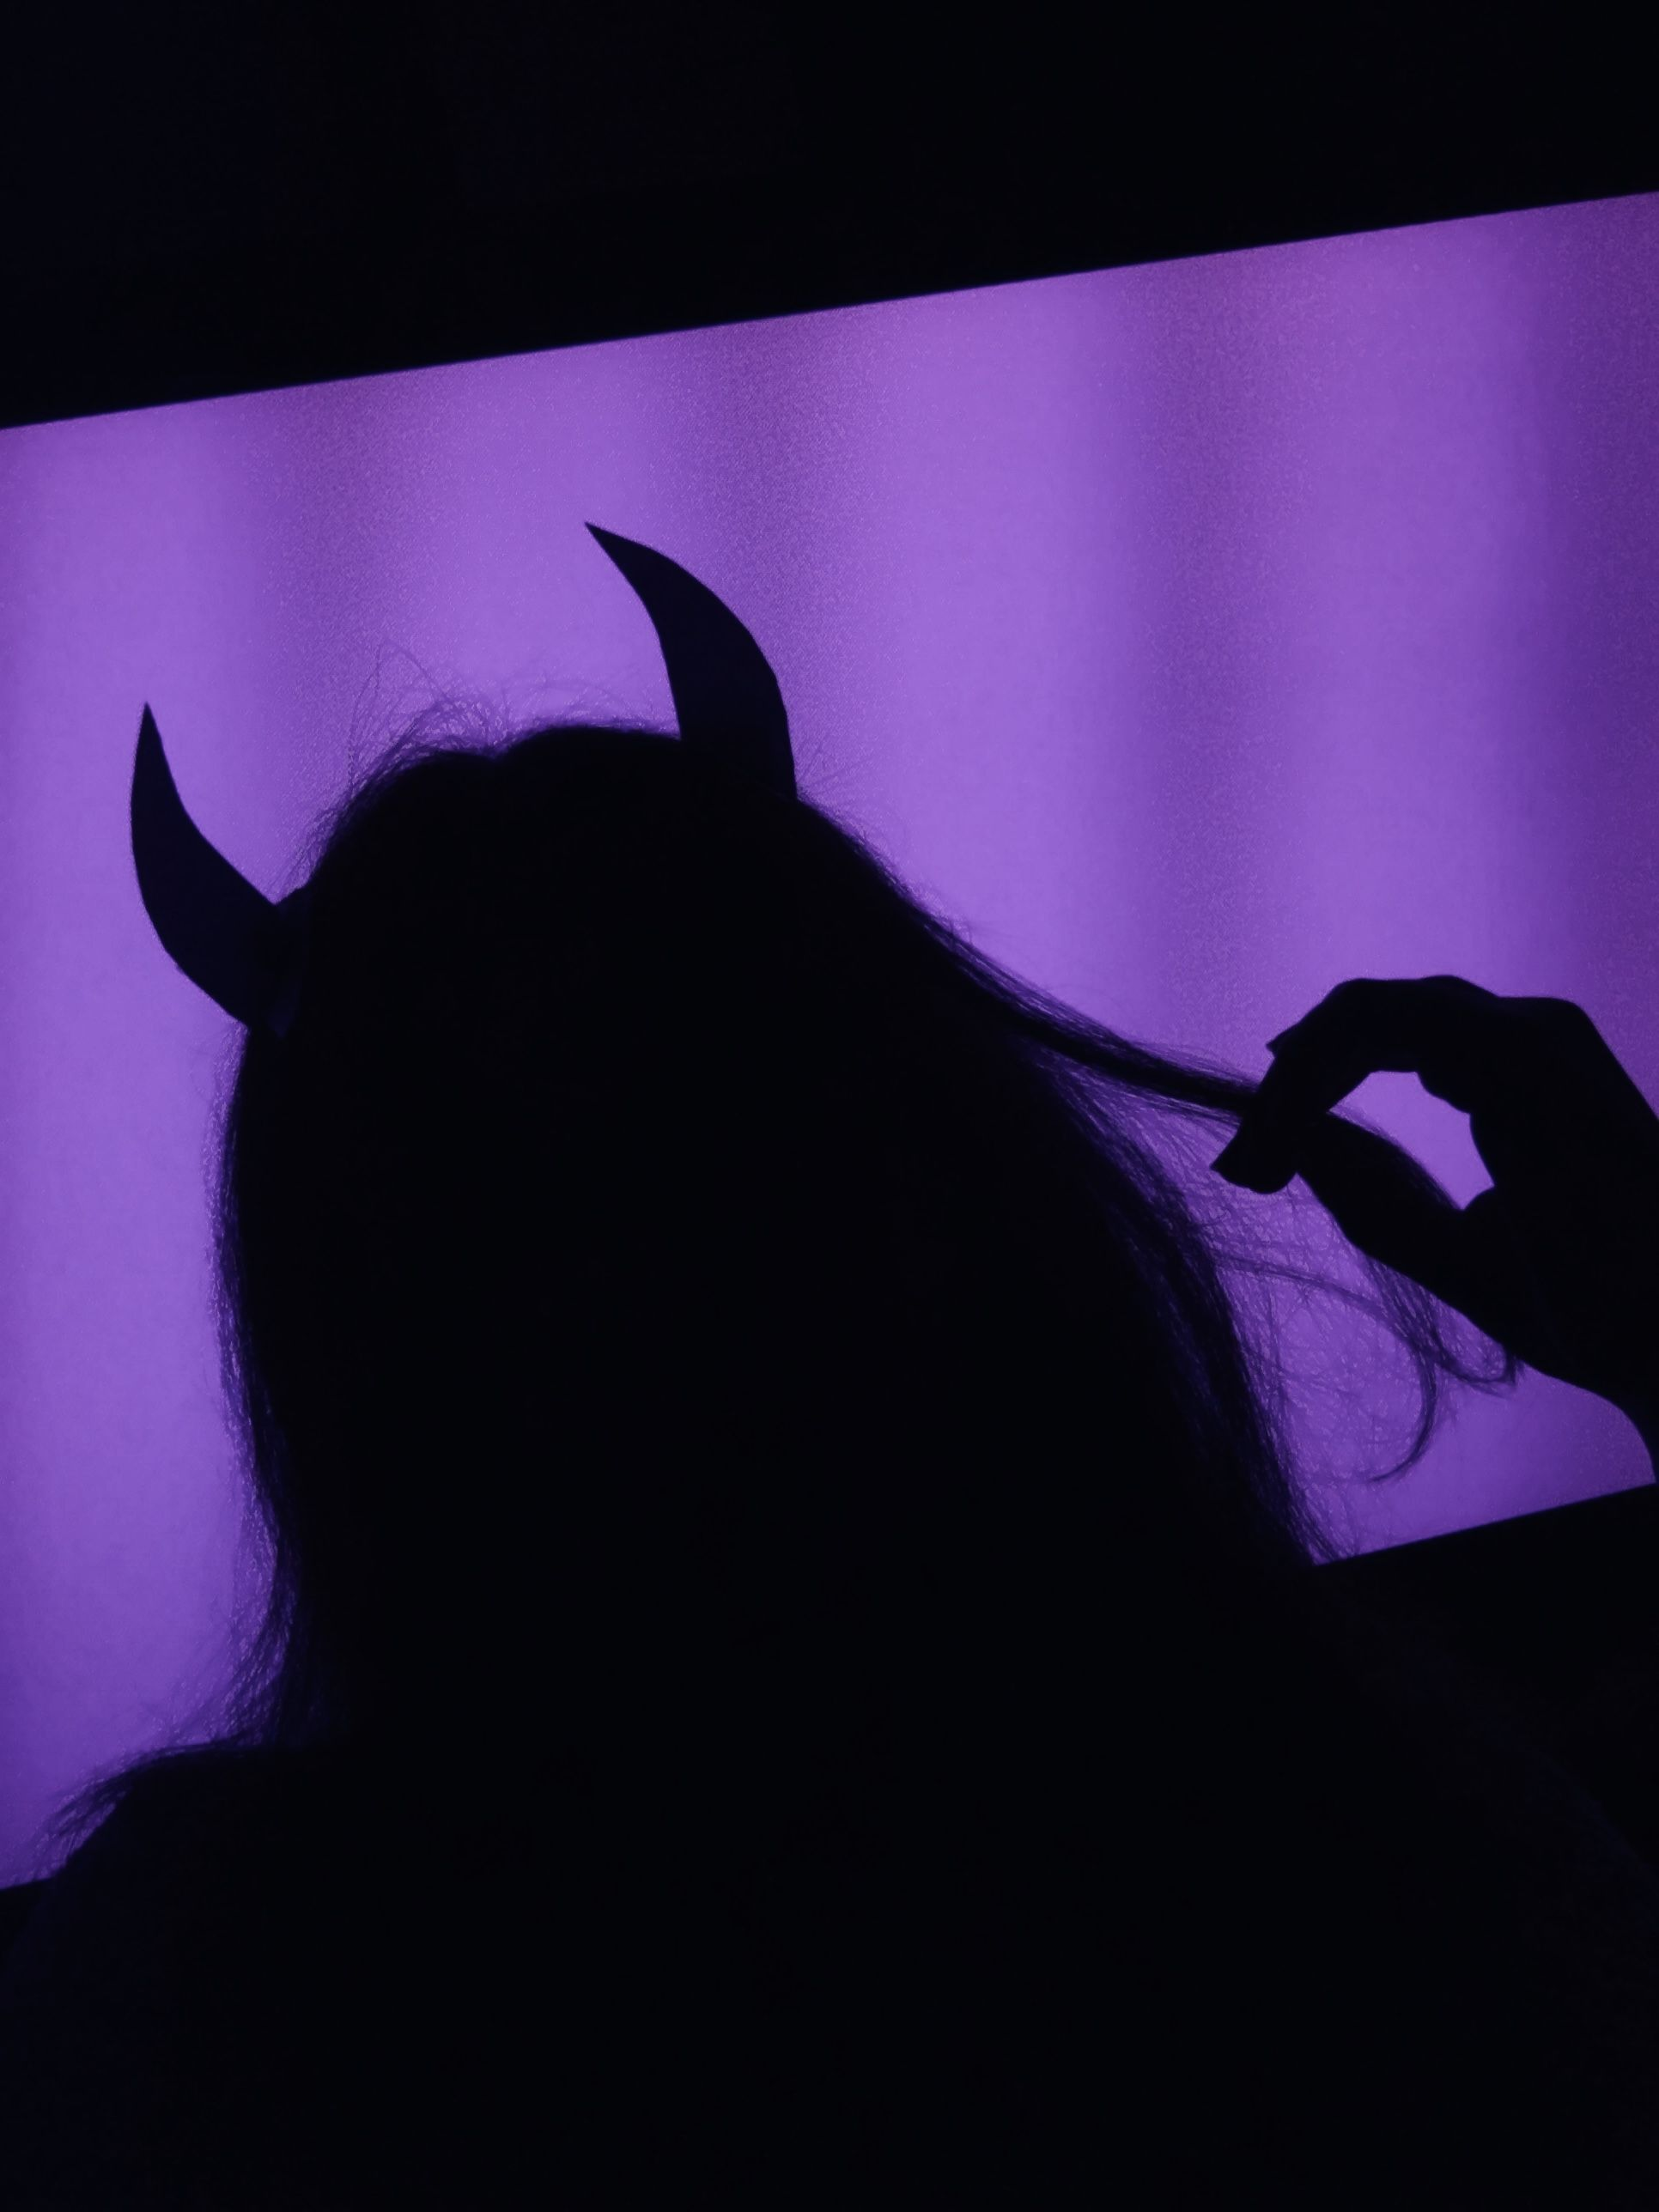 Devil Girl Aesthetic M Fondos De Pantalla Perrones Fondos De